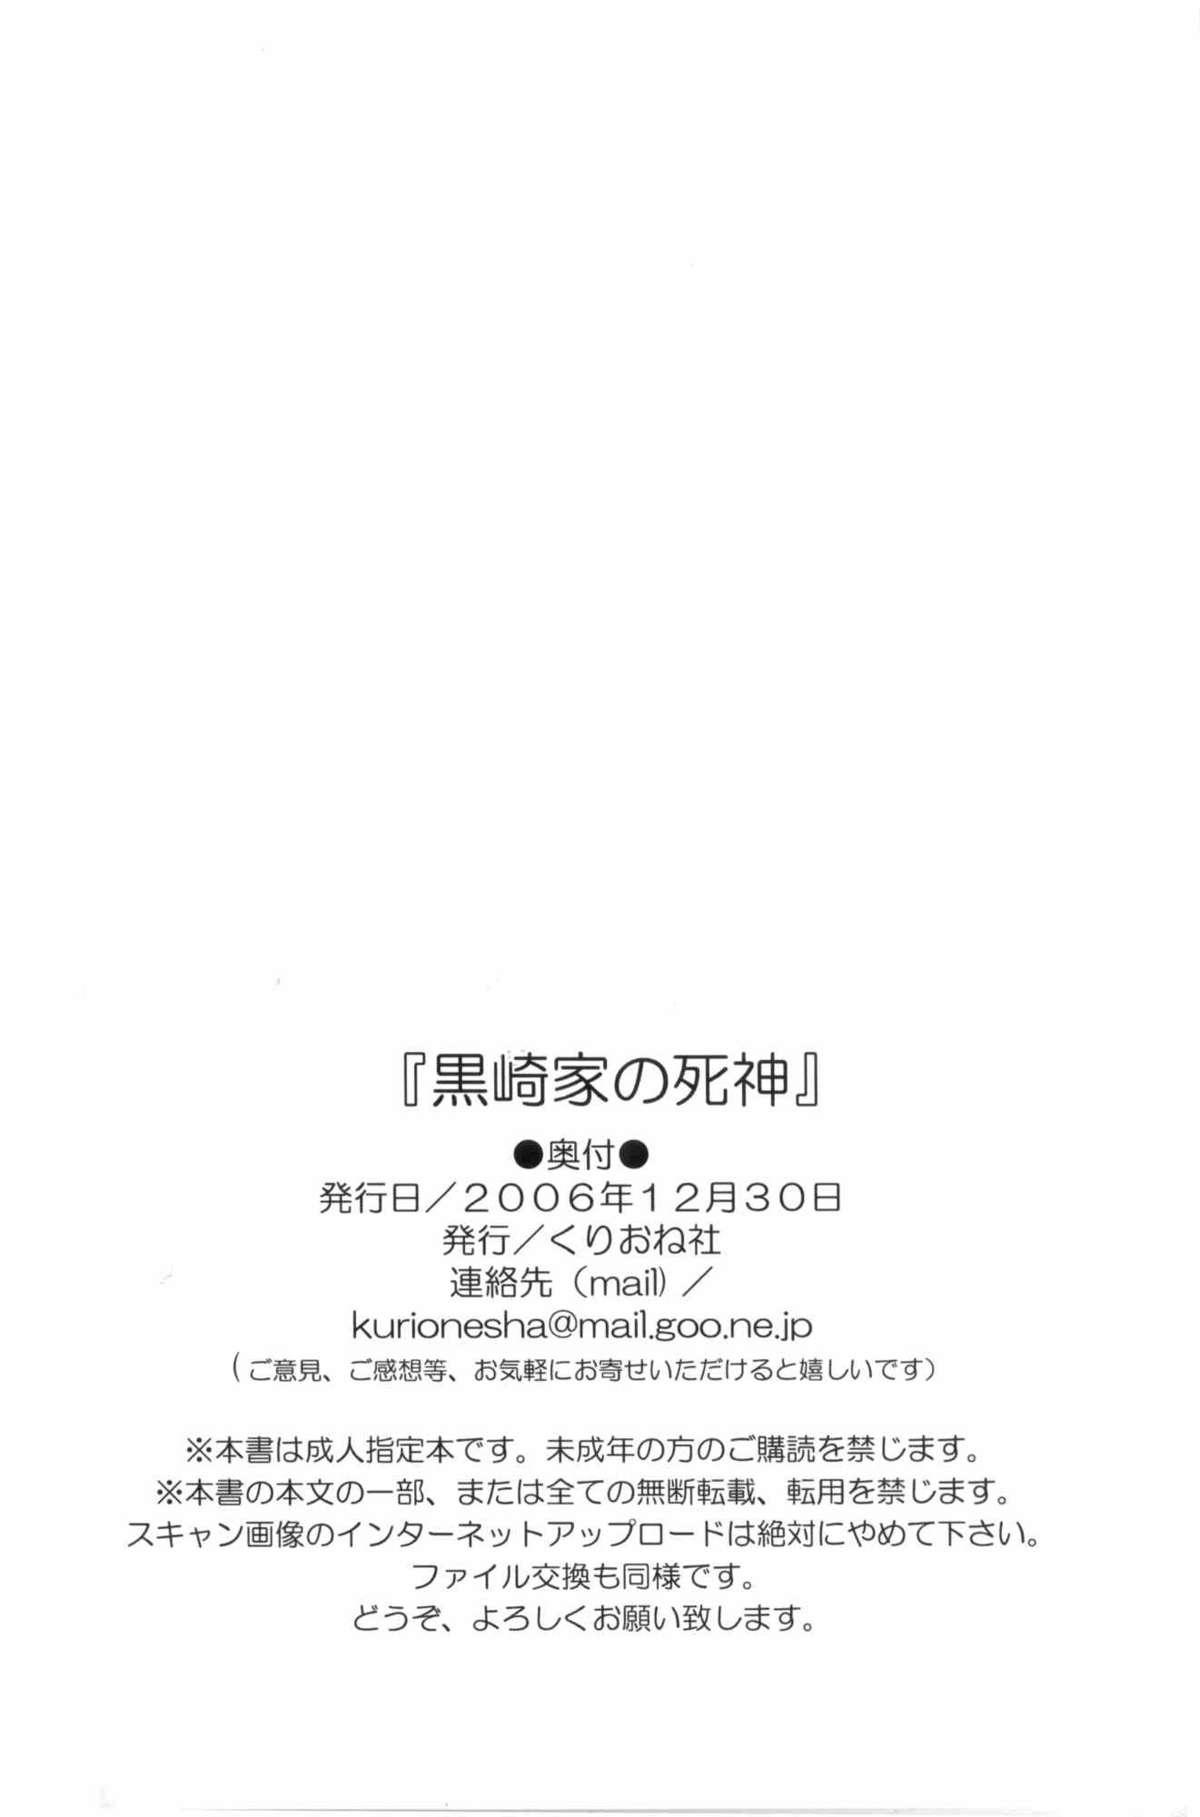 Kurosaki-ke no Shinigami | Shinigami of the Kurosaki Family 28